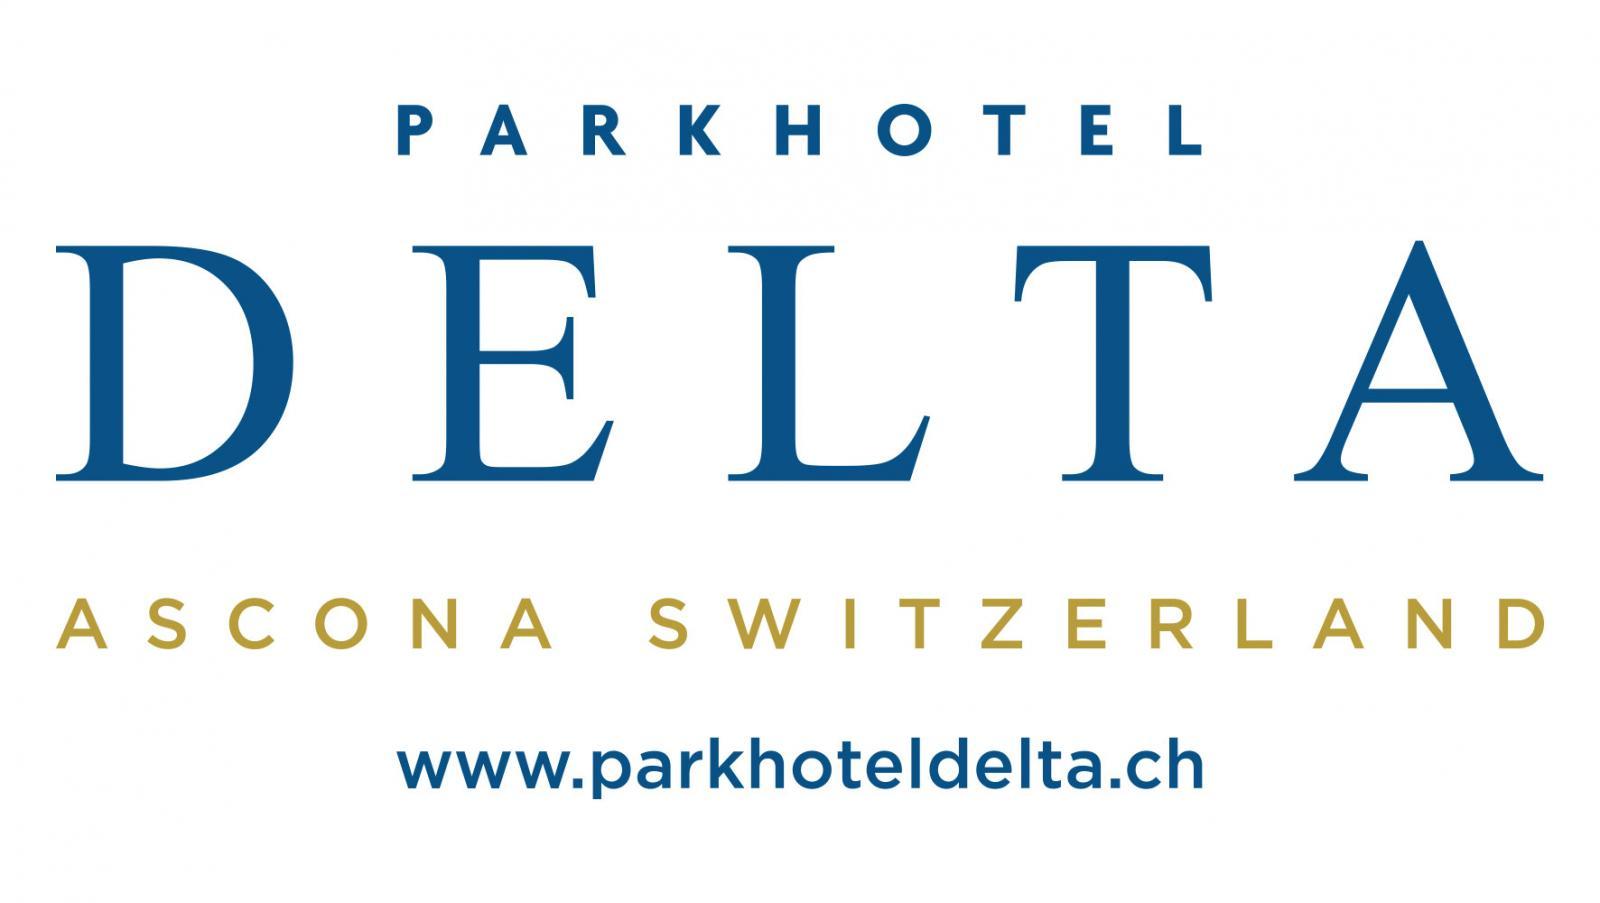 ParkHotel Delta